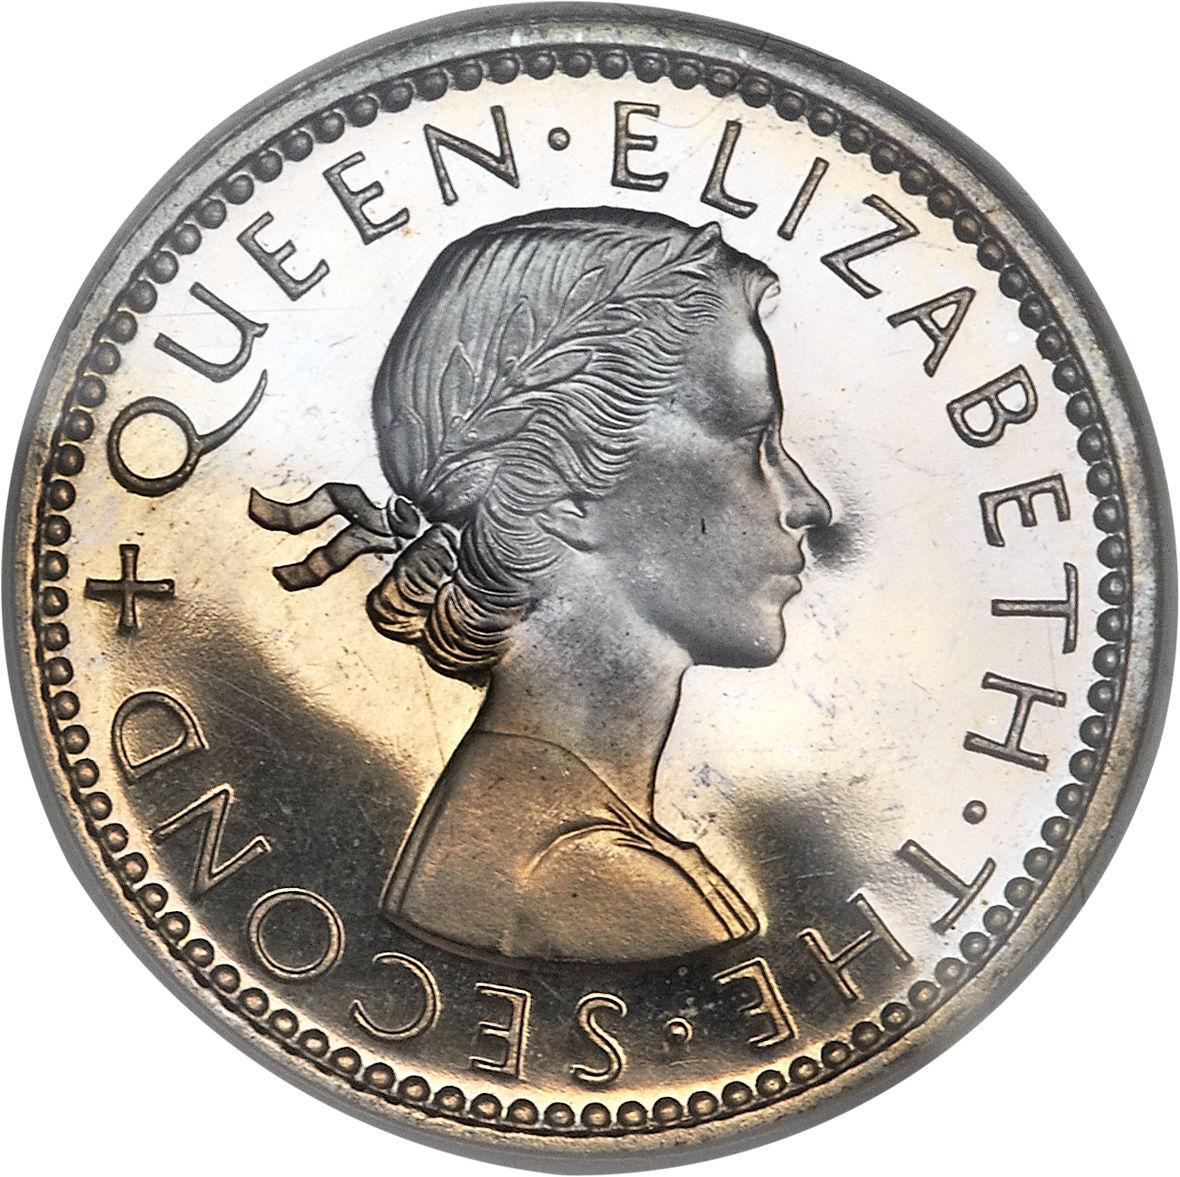 1964 New Zealand 6 Six Pence Queen Elizabeth Huia Bird BU Coin